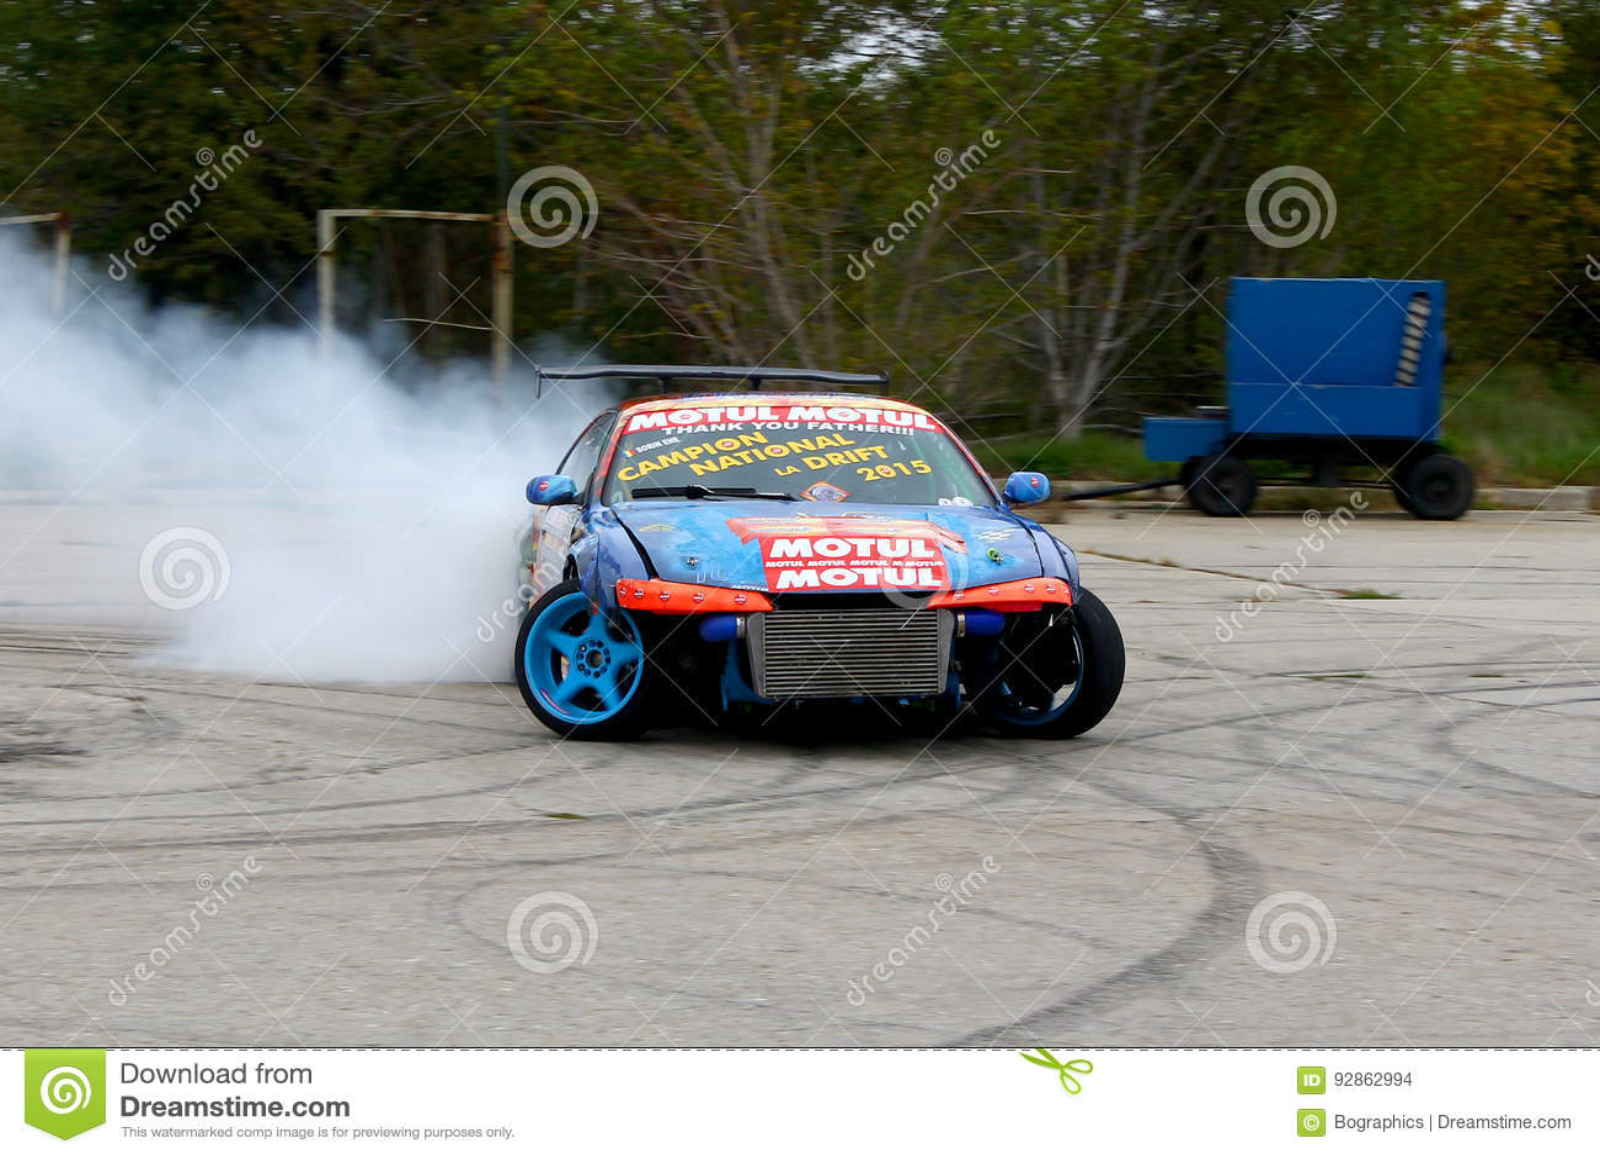 Branded drift car in action